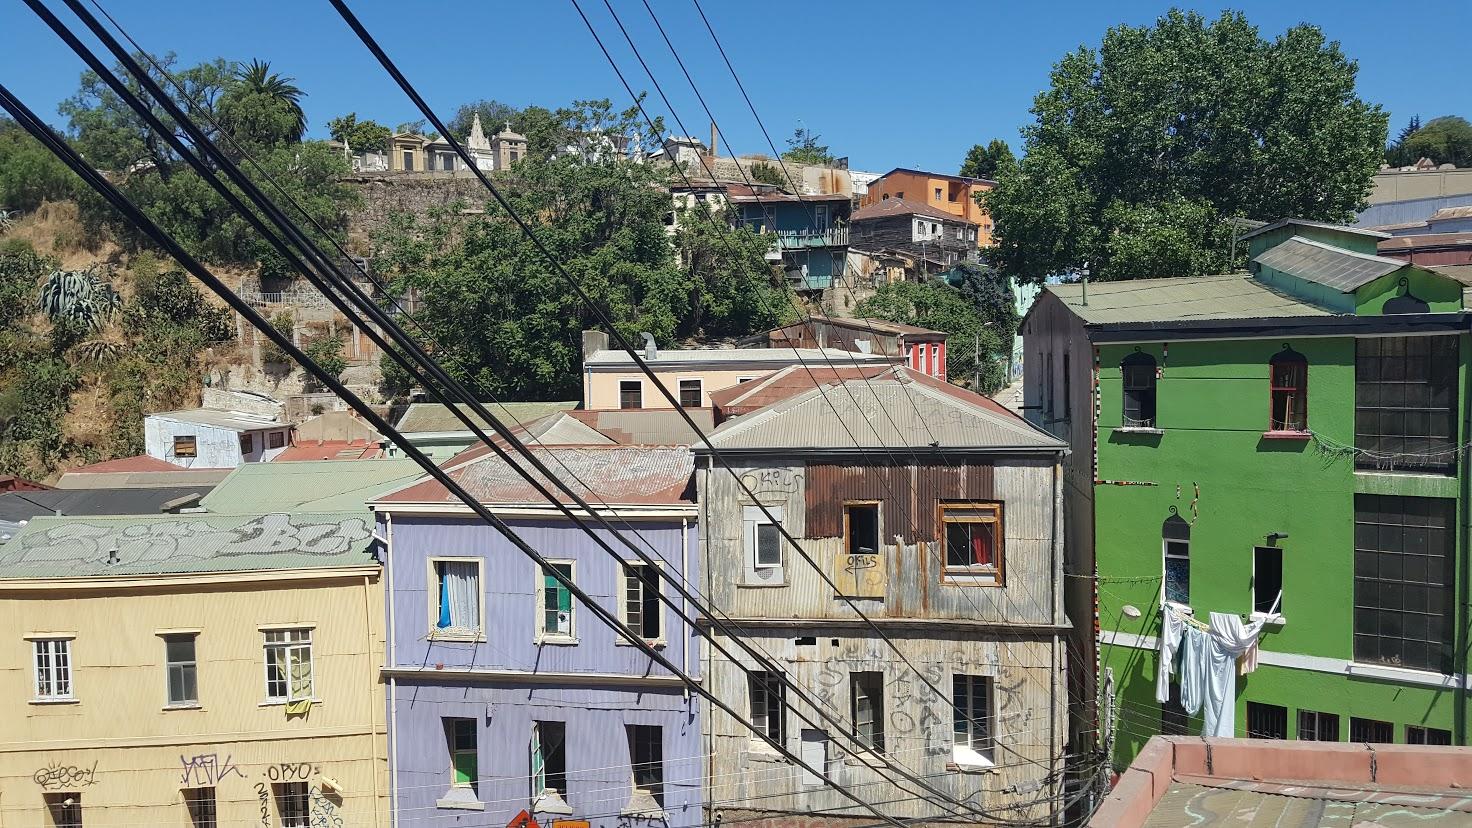 Valparaiso: pastels and pylons